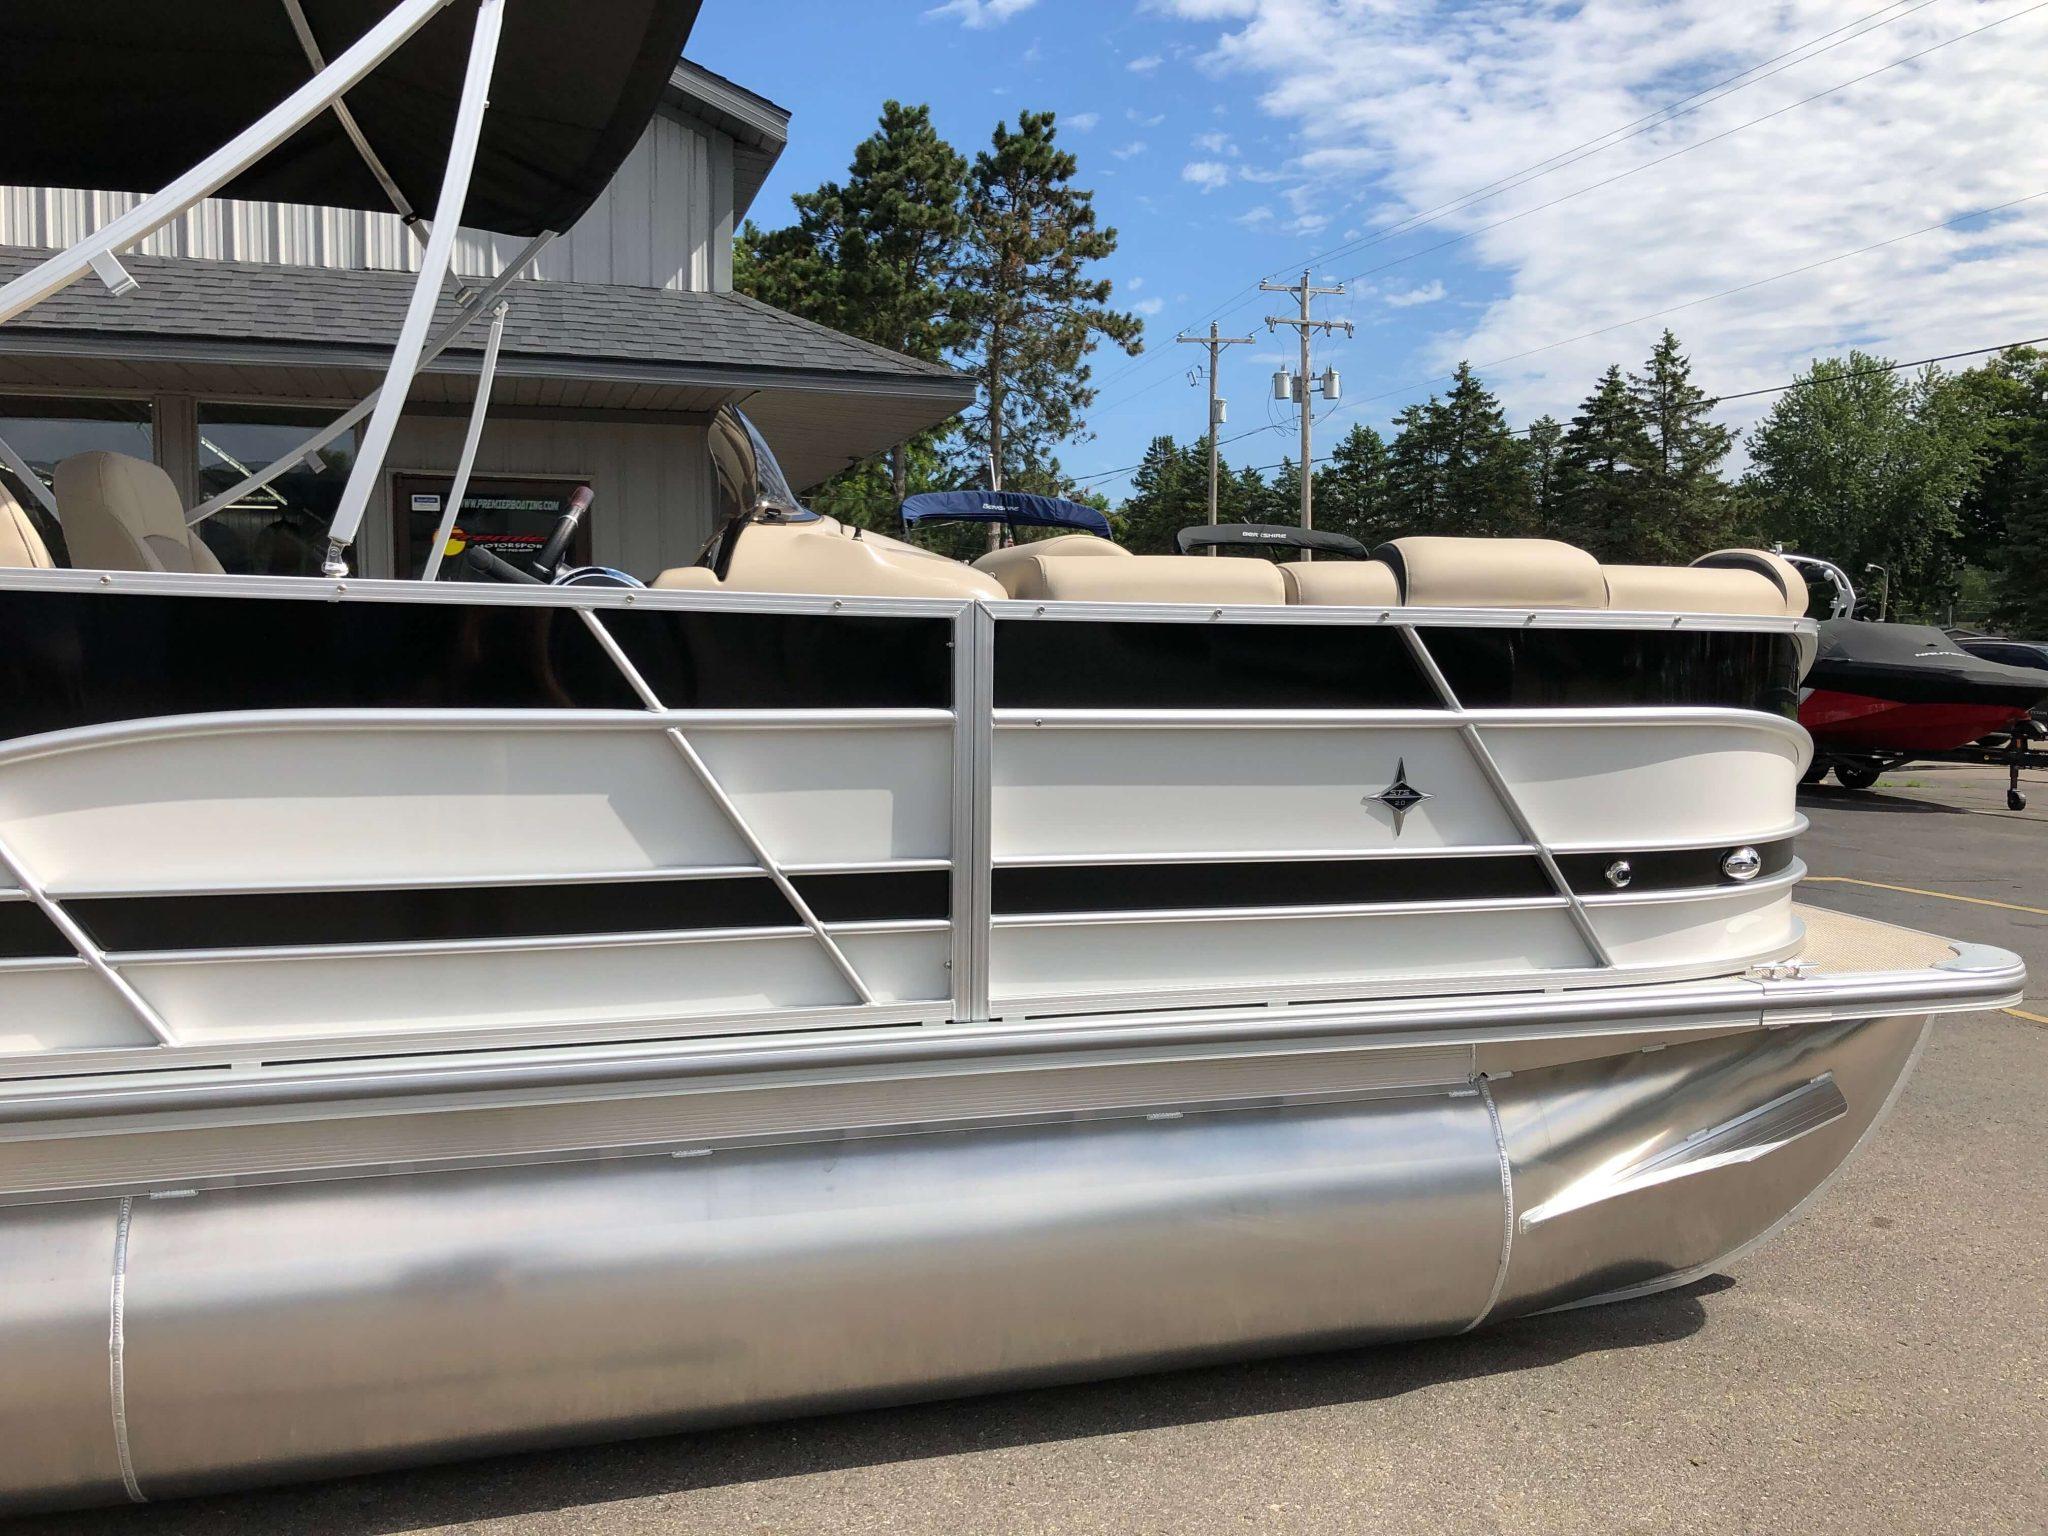 2019 Berkshire 23RFX STS Pontoon Boat 5